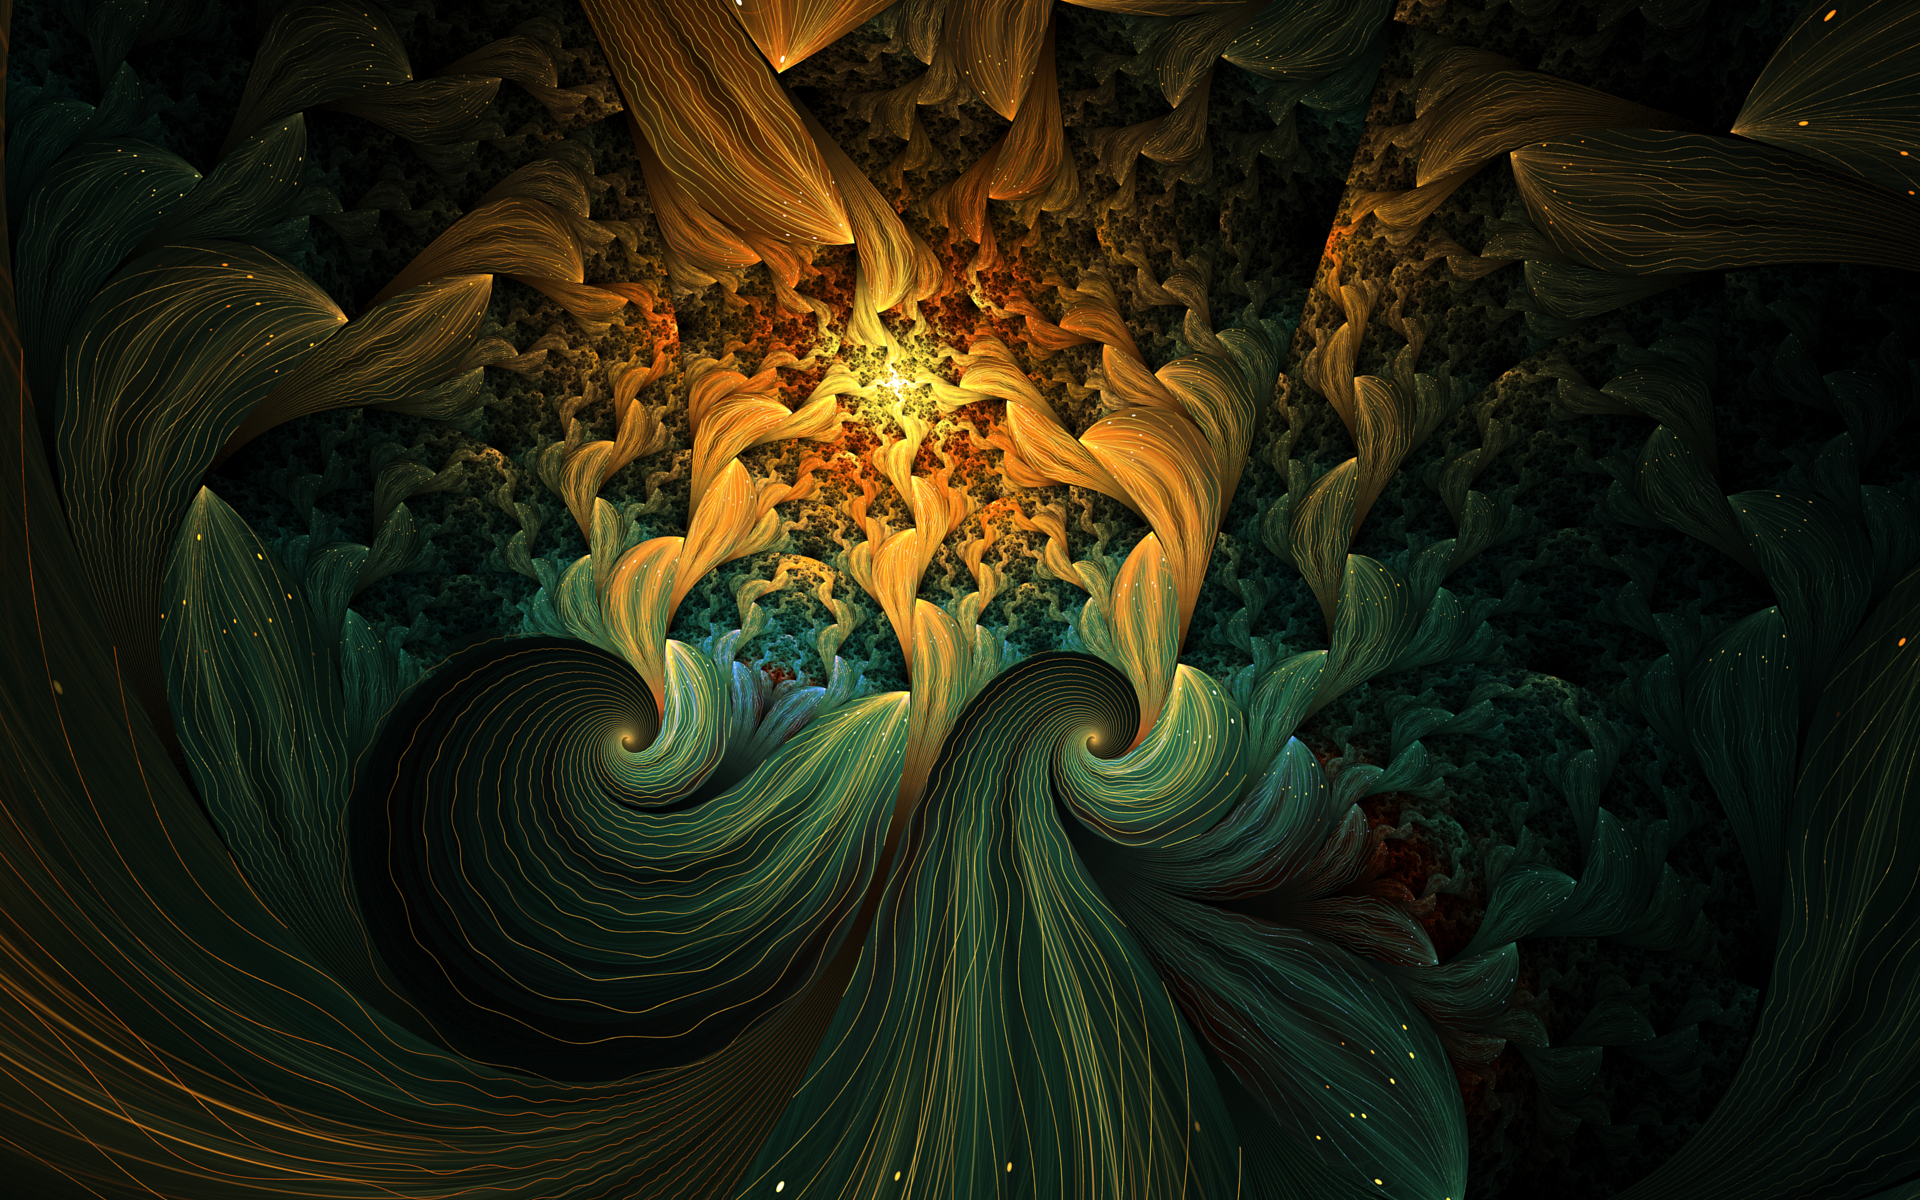 Night Magic by tatasz